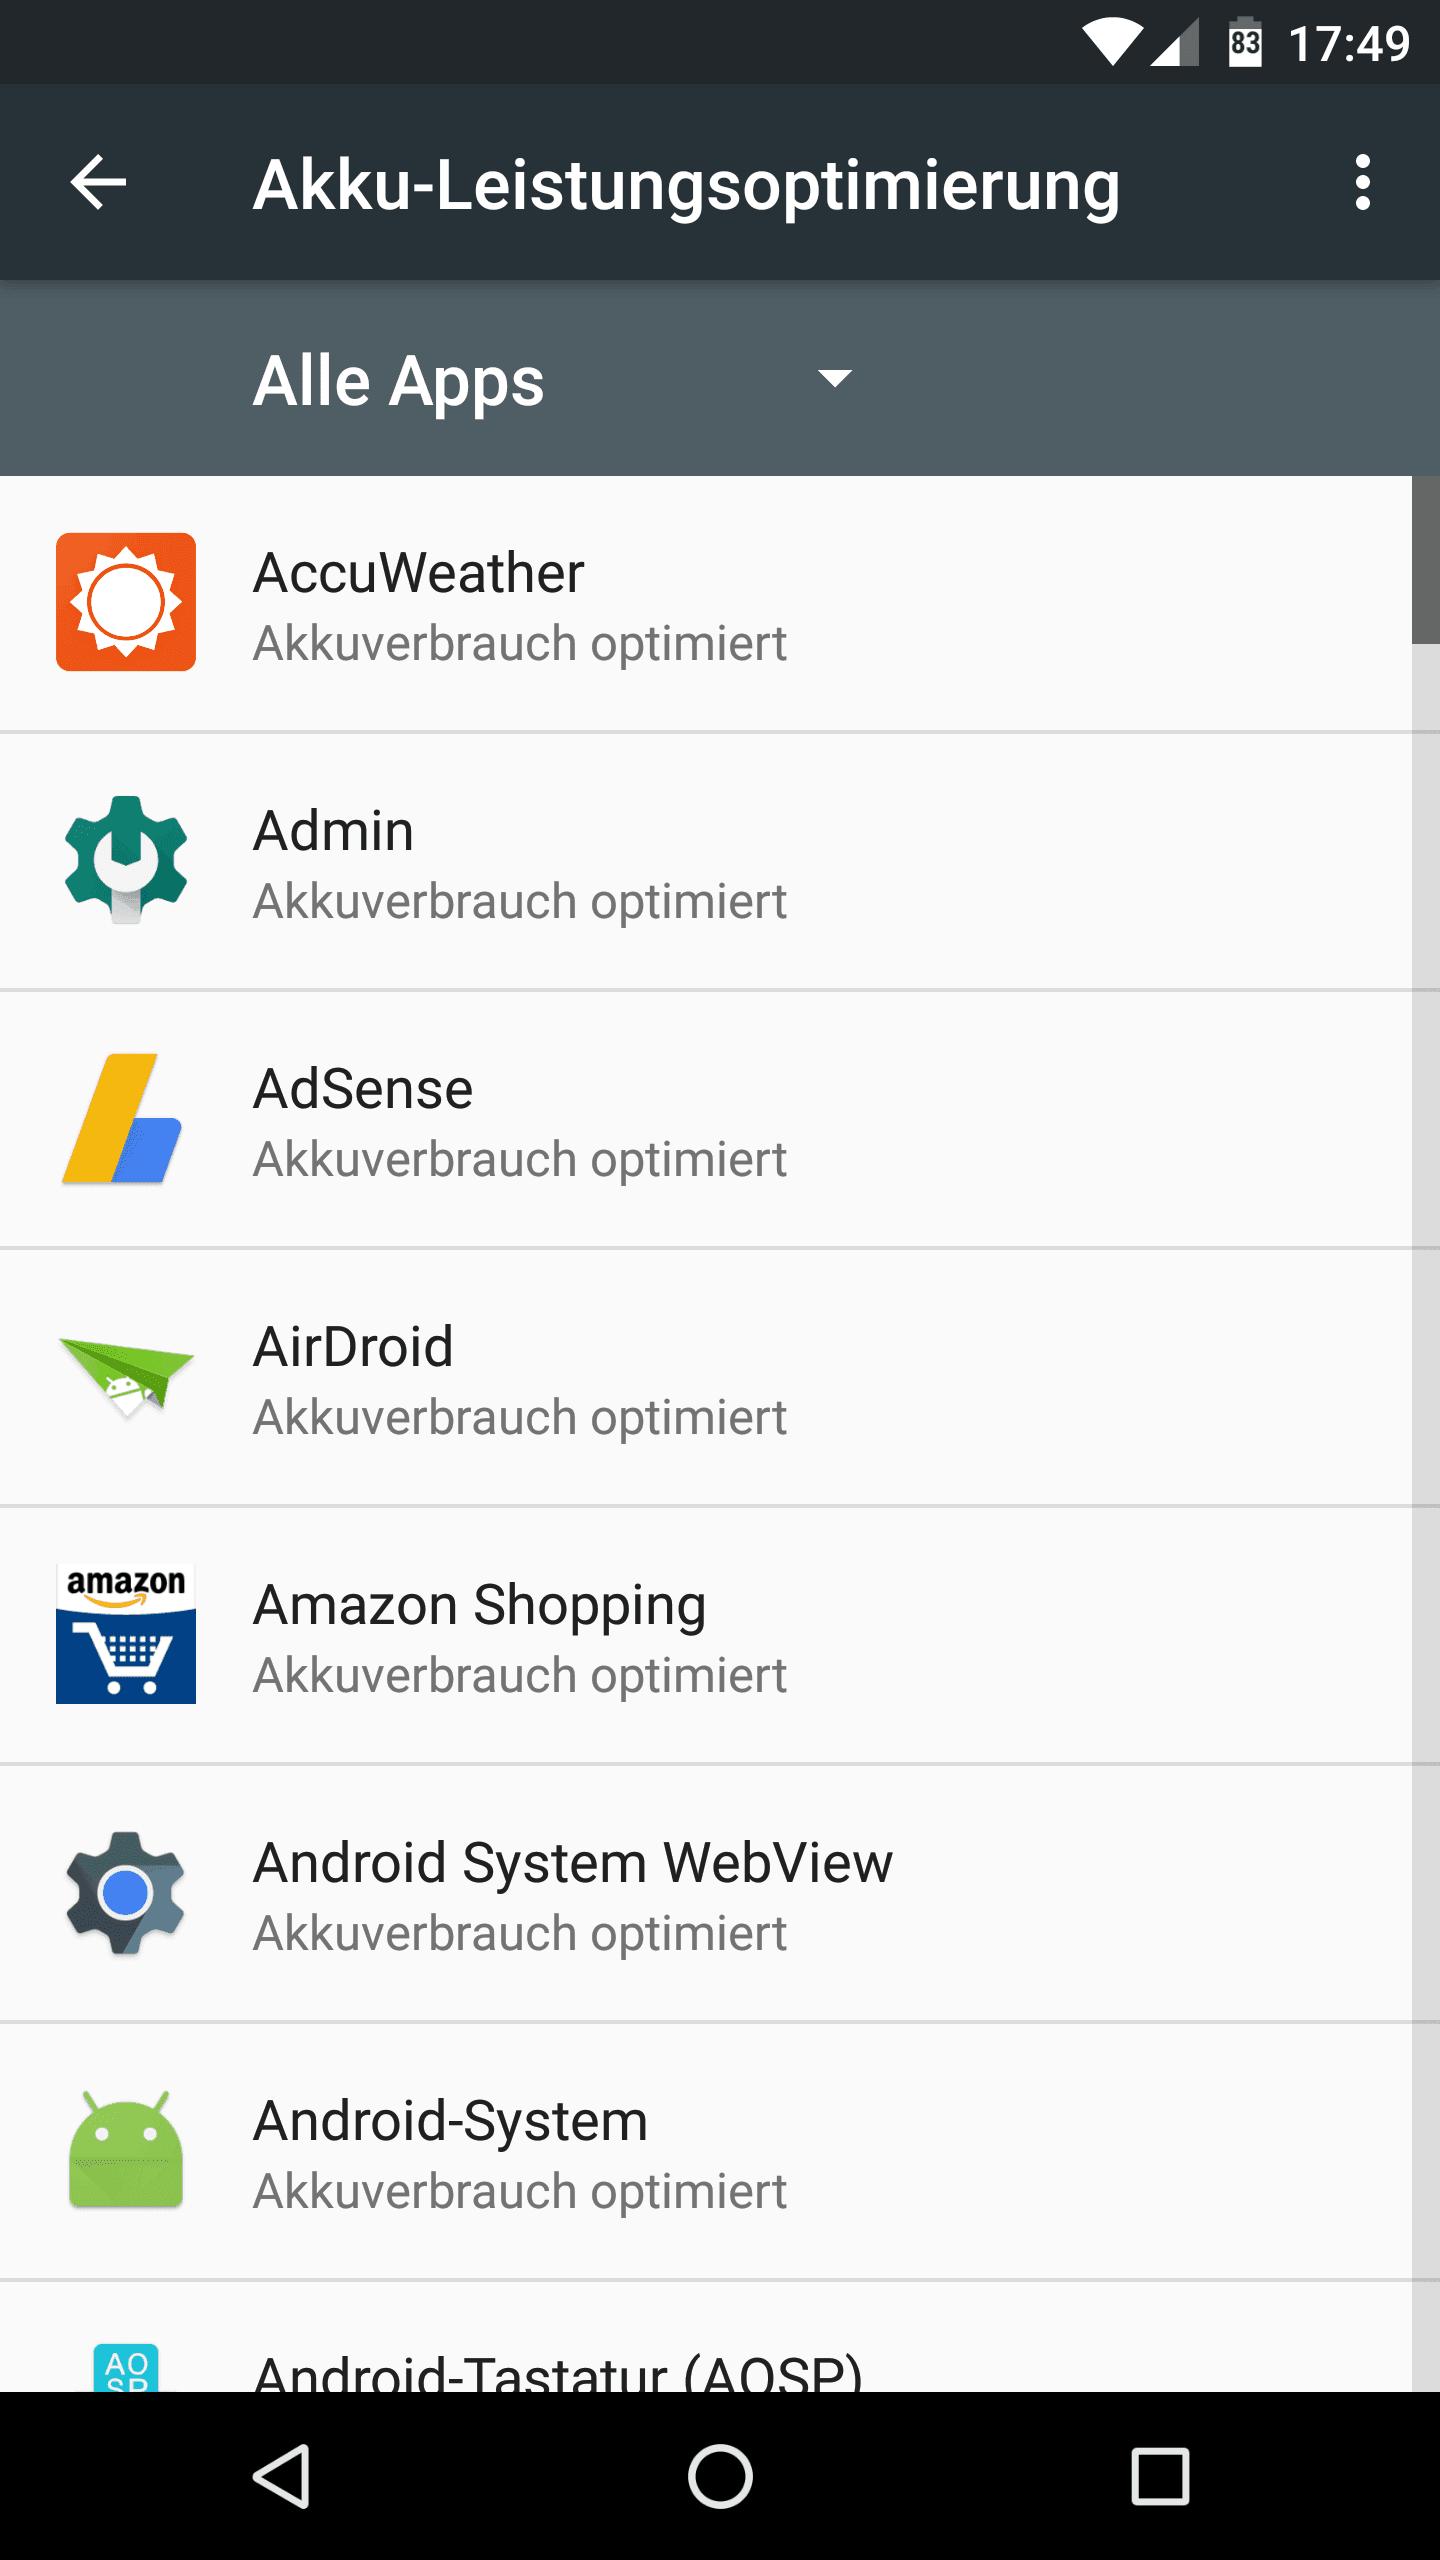 Anleitung: Doze deaktivieren unter Android Nougat & Marshmallow 6 techboys.de • smarte News, auf den Punkt! Anleitung: Doze deaktivieren unter Android Nougat & Marshmallow